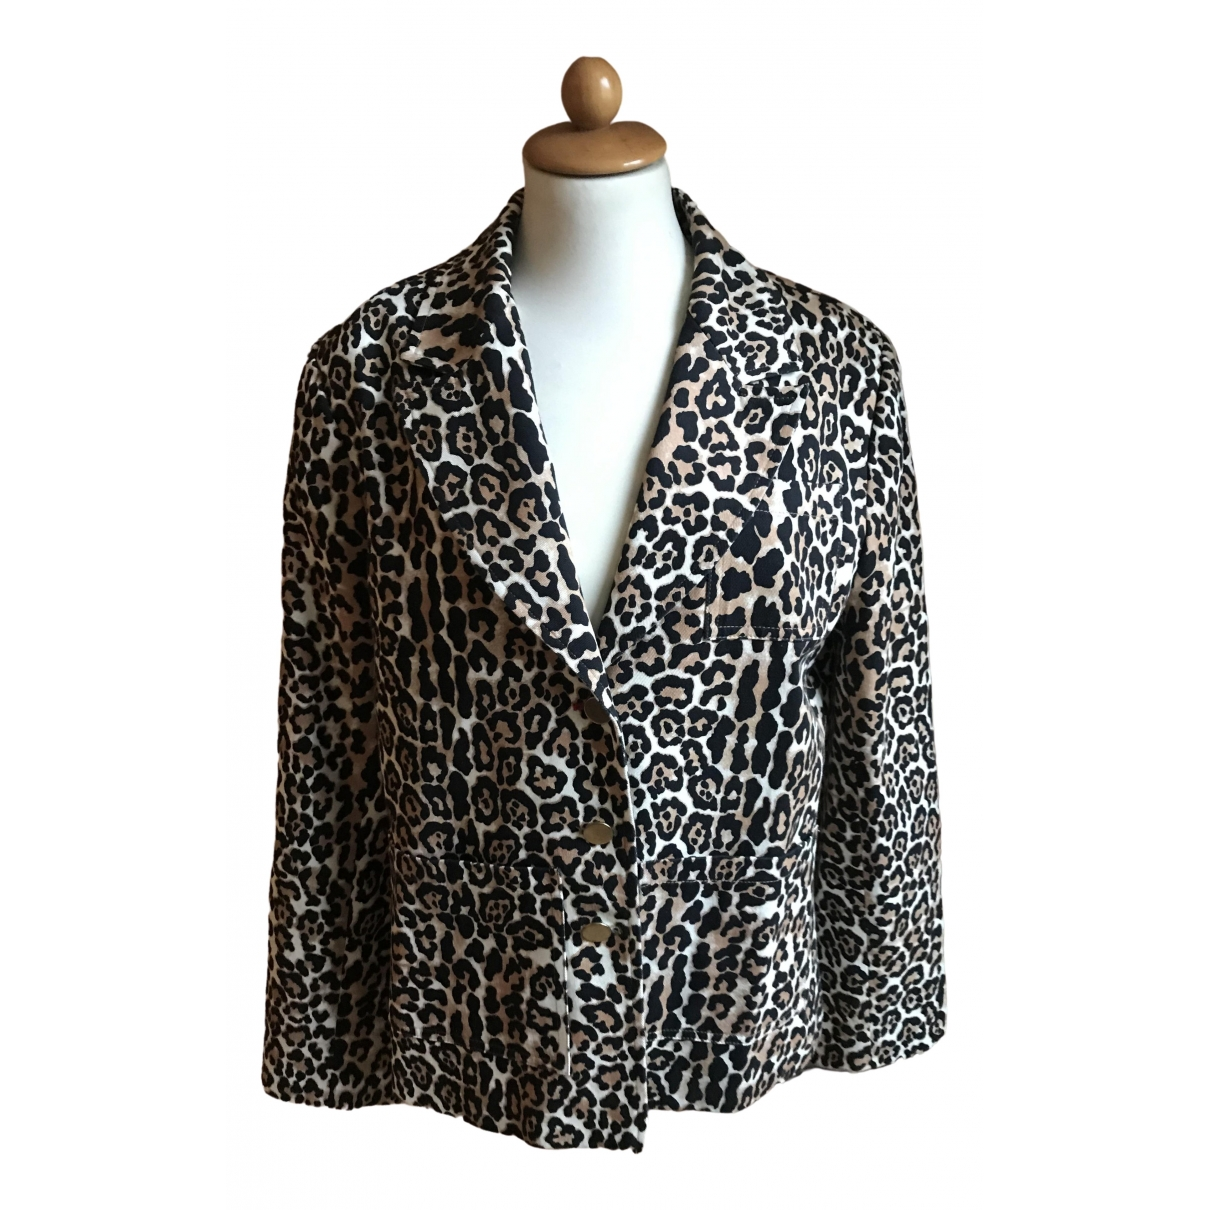 Rika \N Cotton jacket for Women L International